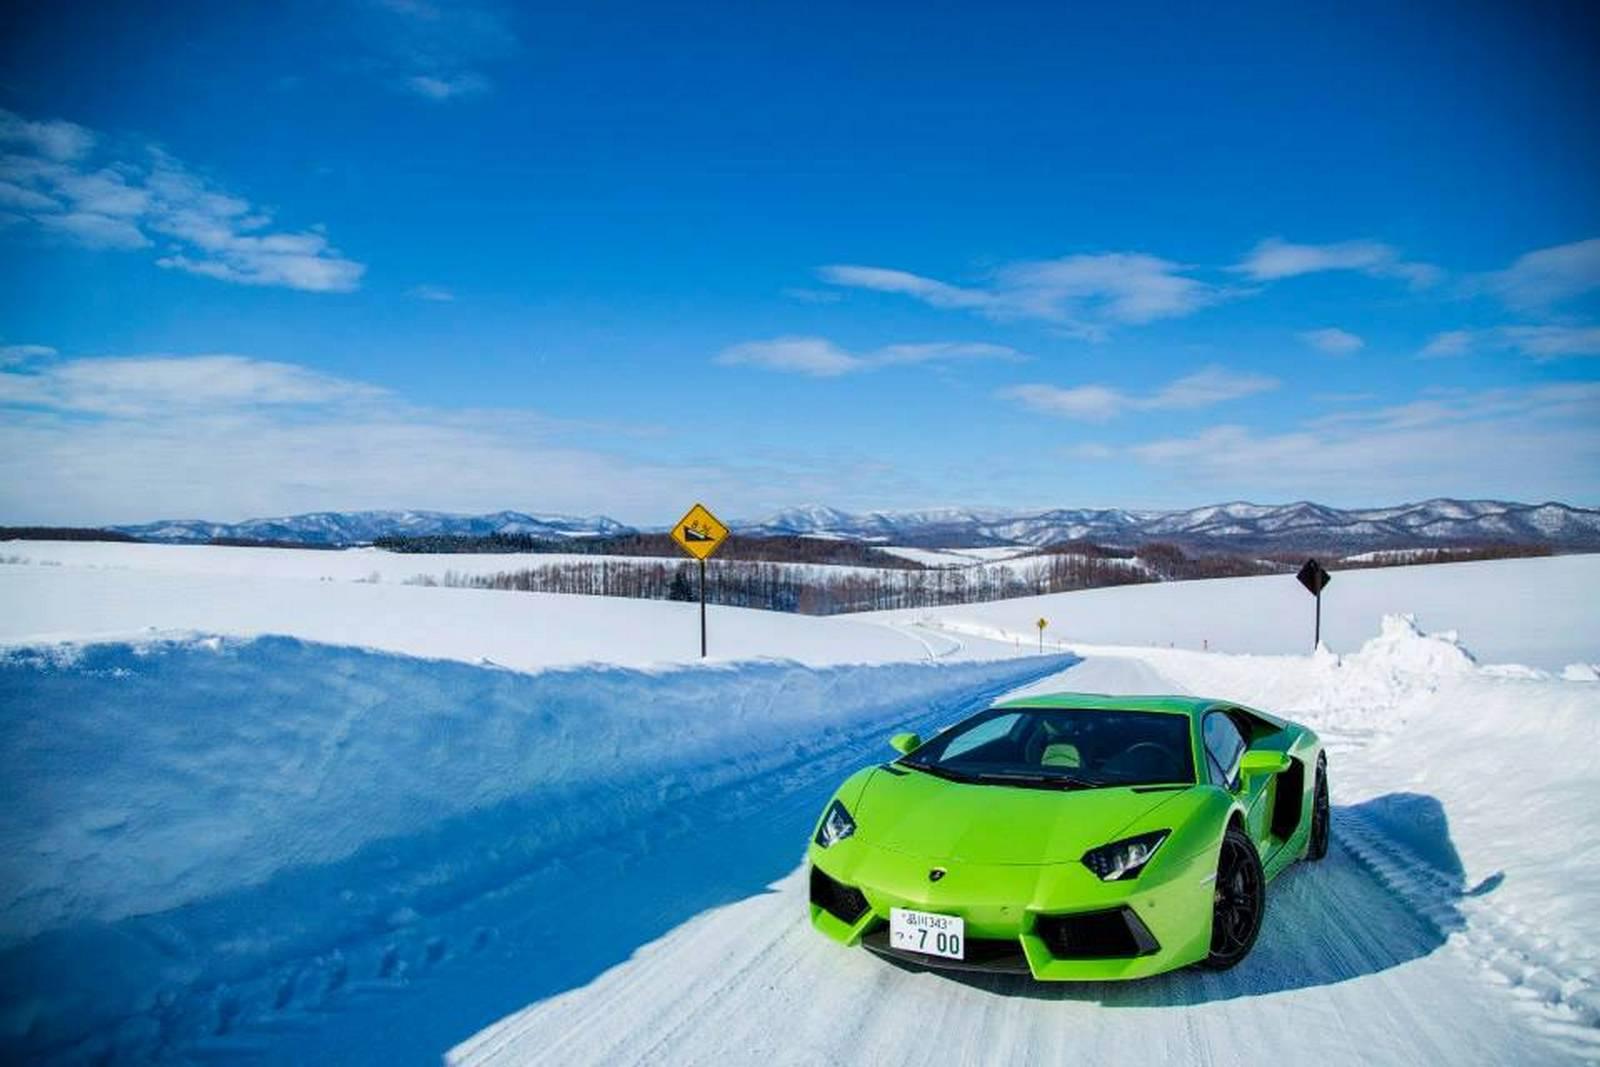 Lamborghinis For Sale >> Gallery: Lamborghini Winter Academy in Hokkaido, Japan ...